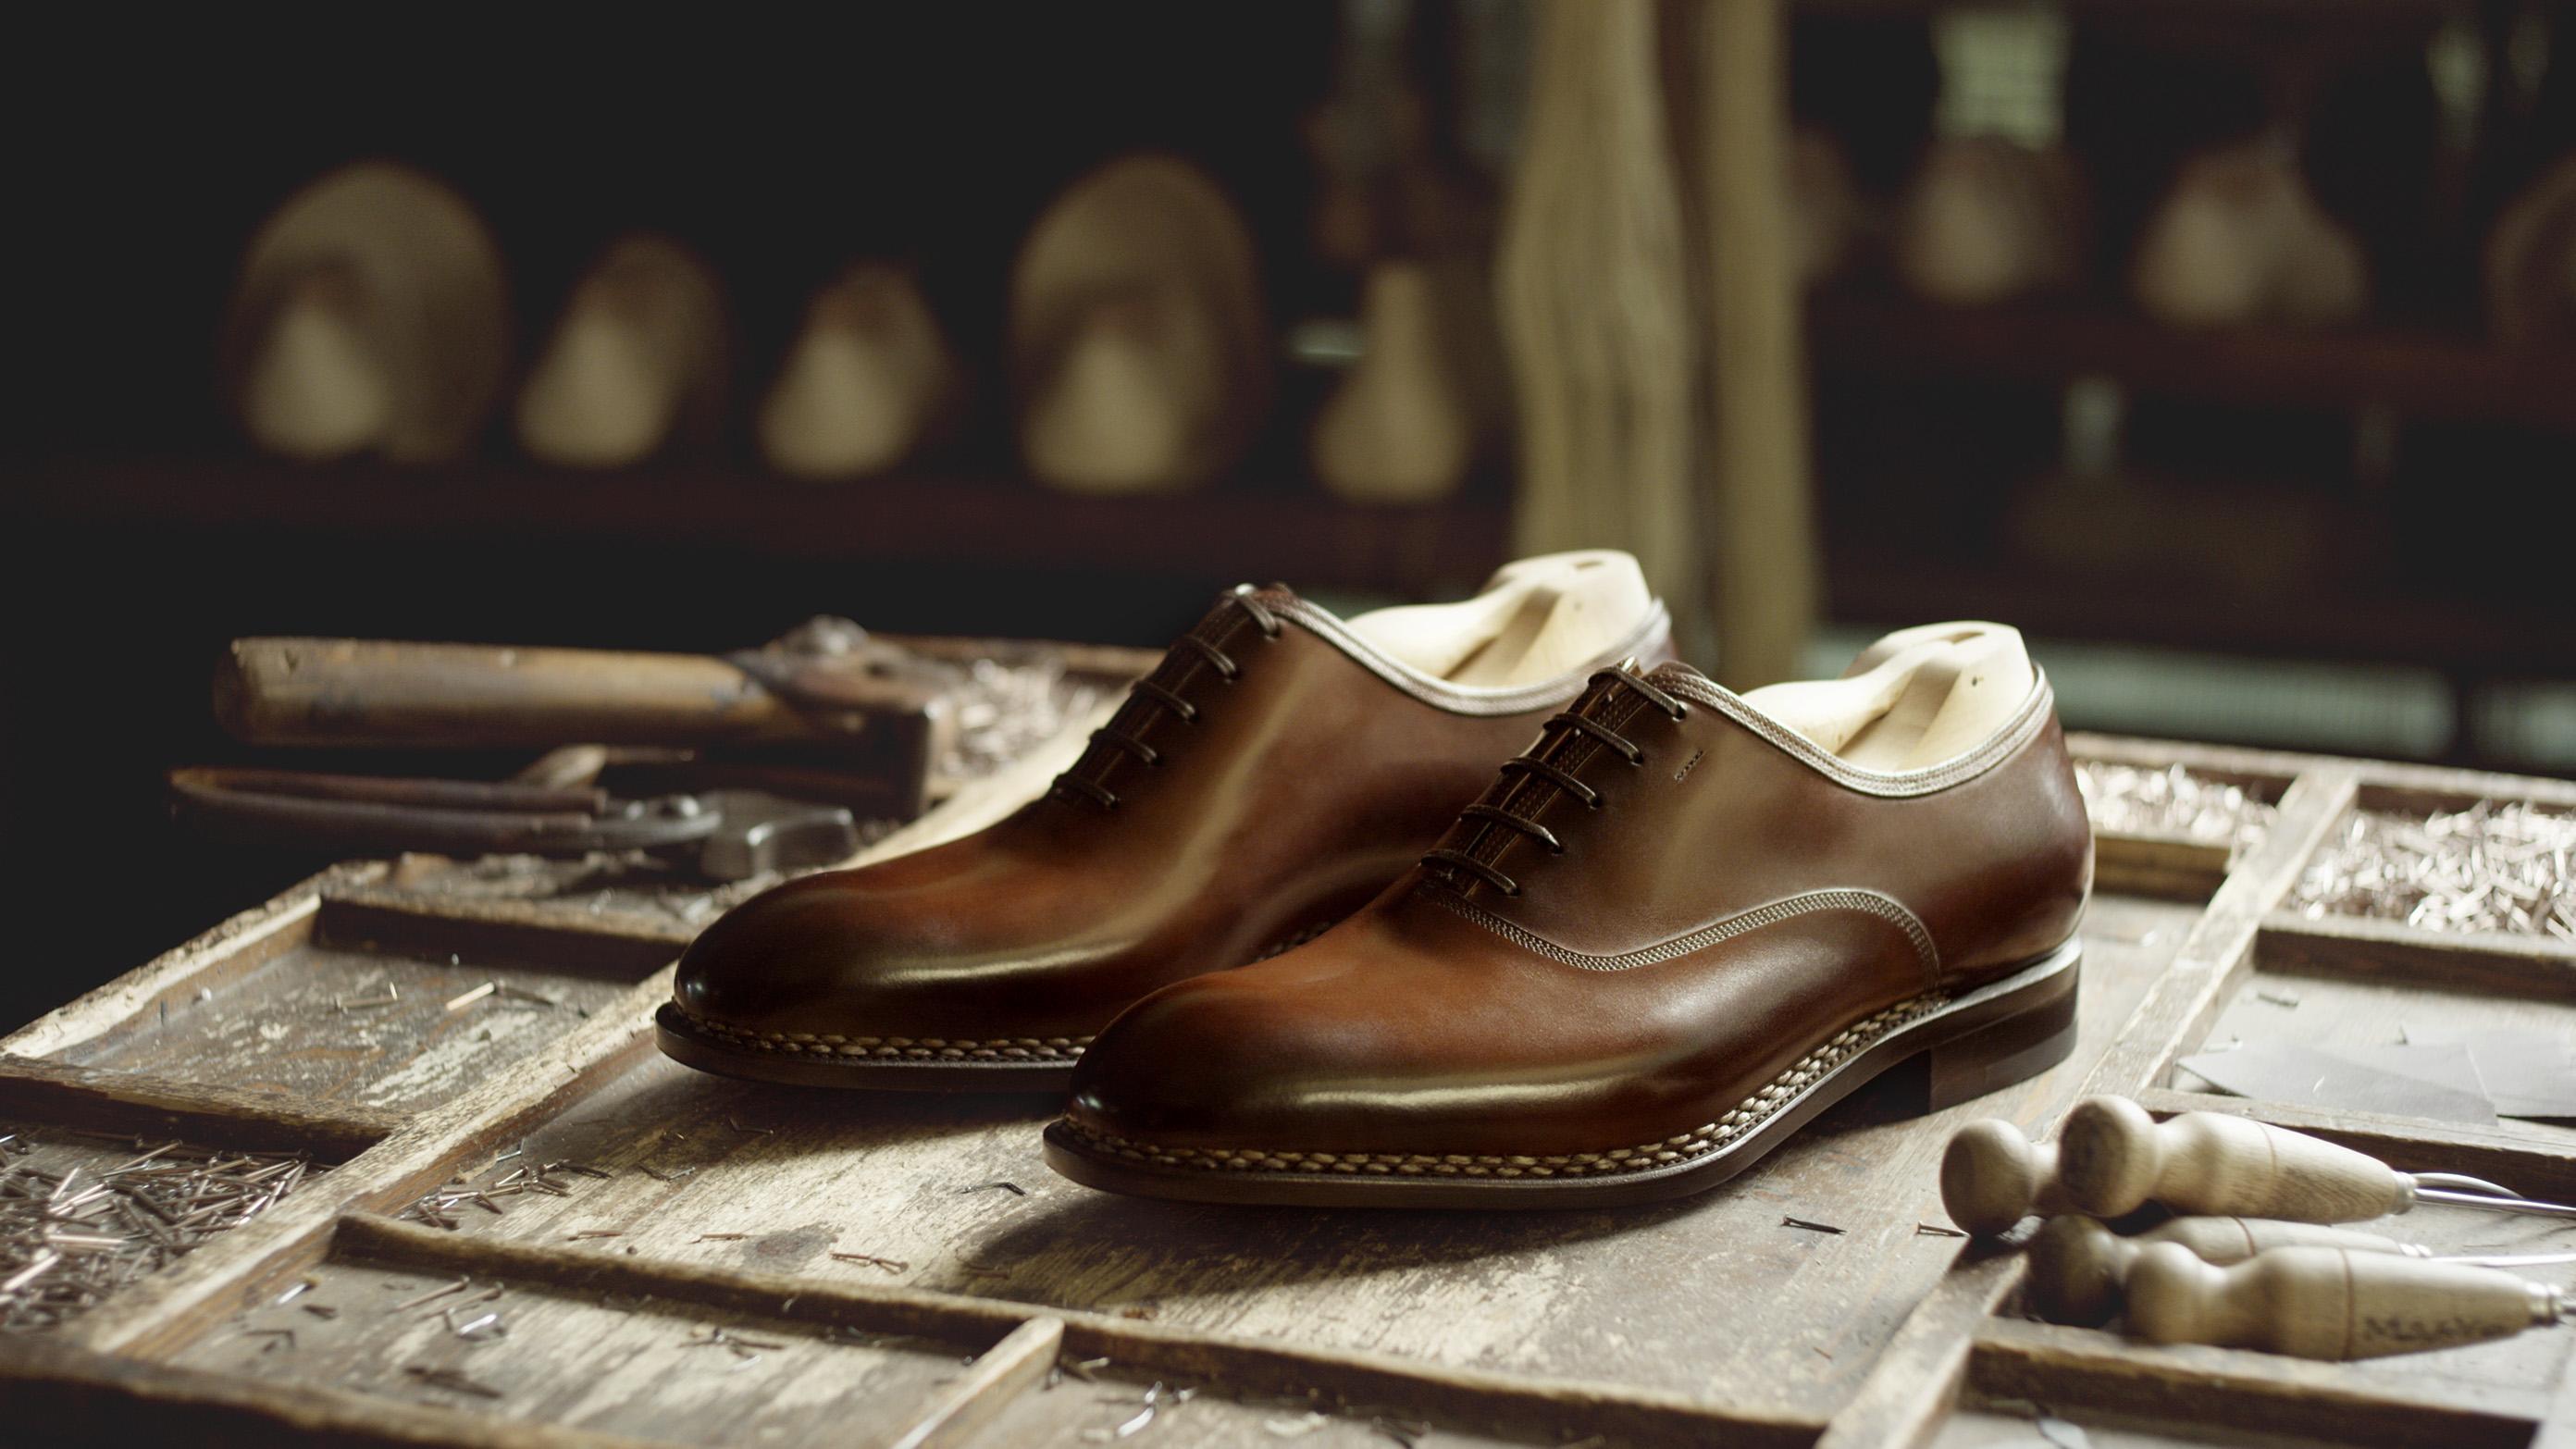 A pair of Tramezza men's shoes by Salvatore Ferragamo.